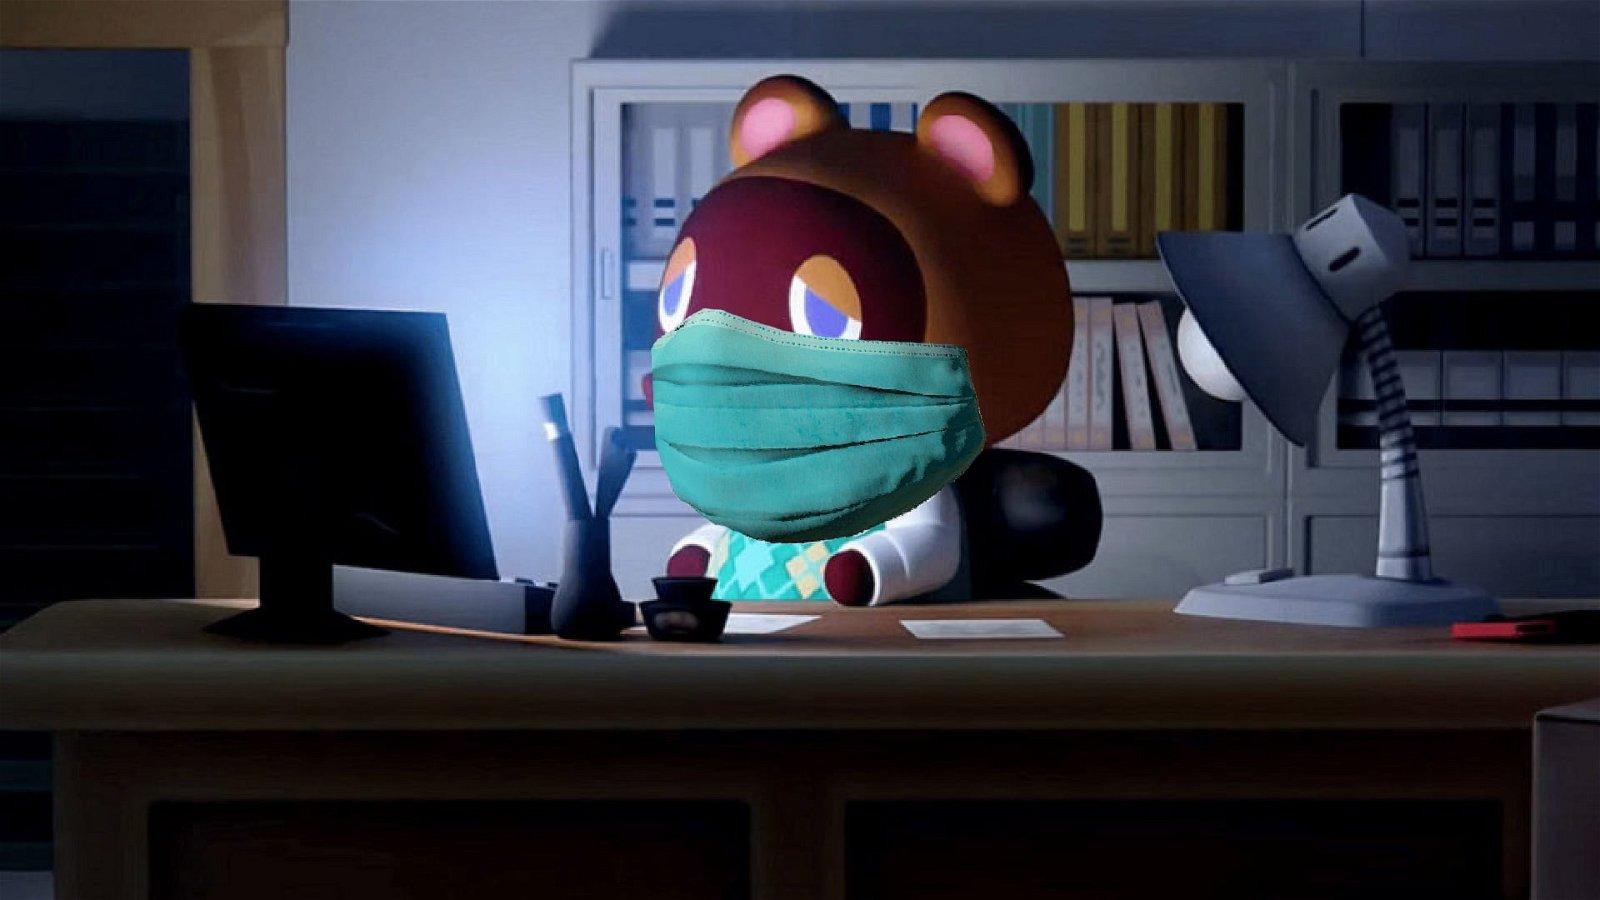 Animal Crossing: New Horizon Players Are Terrified of Sneezing Emote